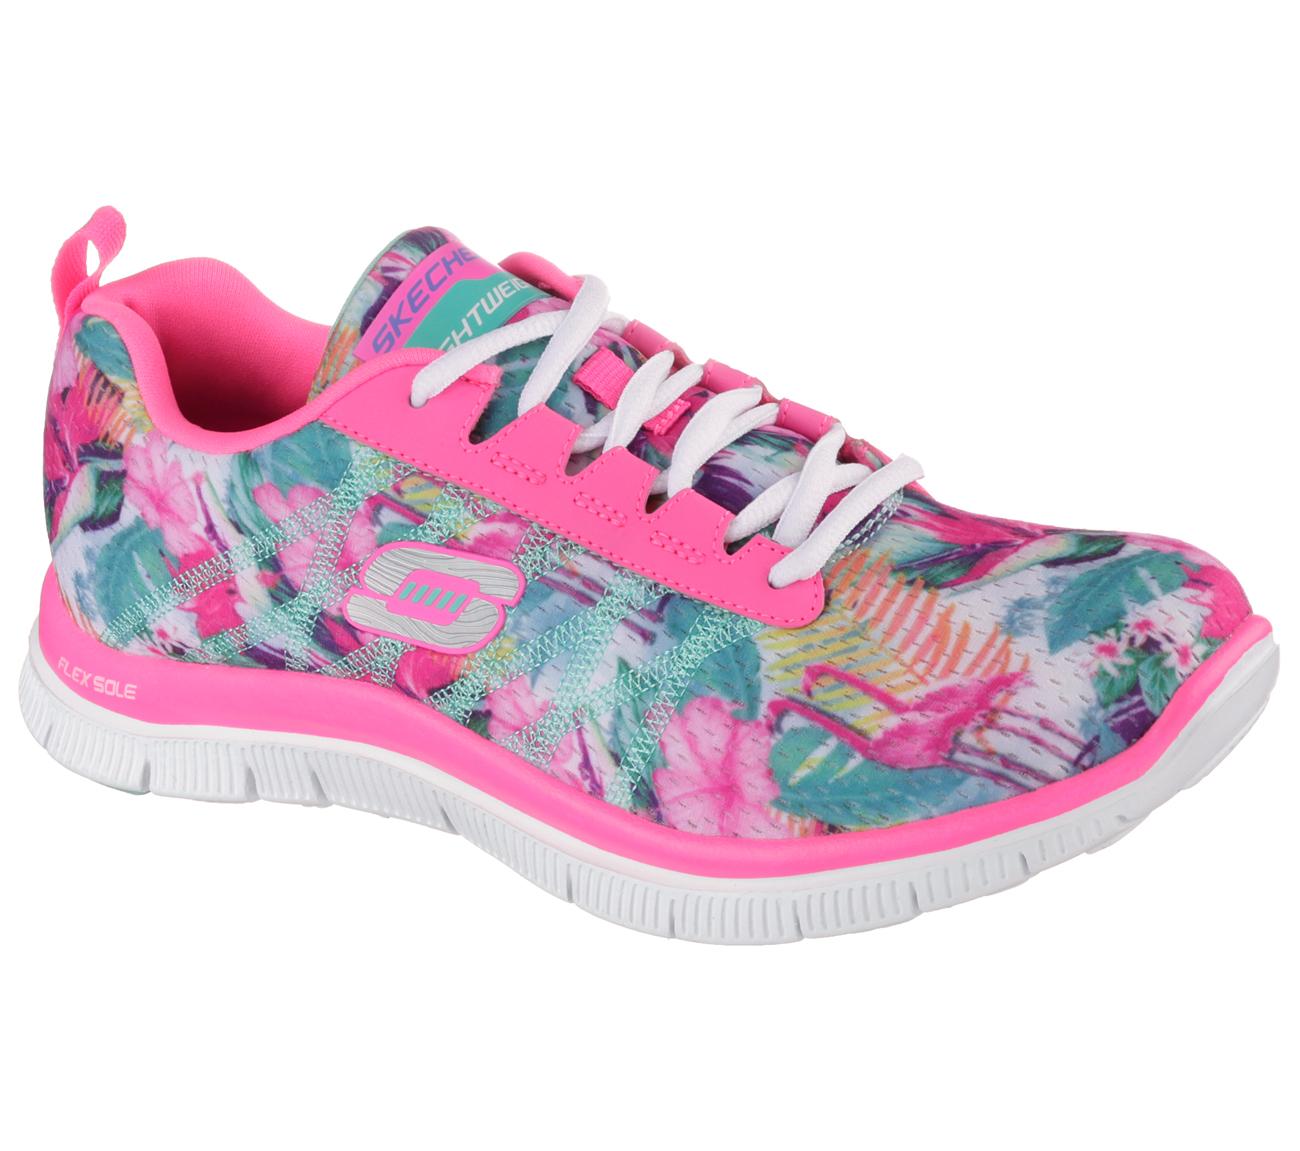 Skechers Women's Straightaway Shoe | ThisNext